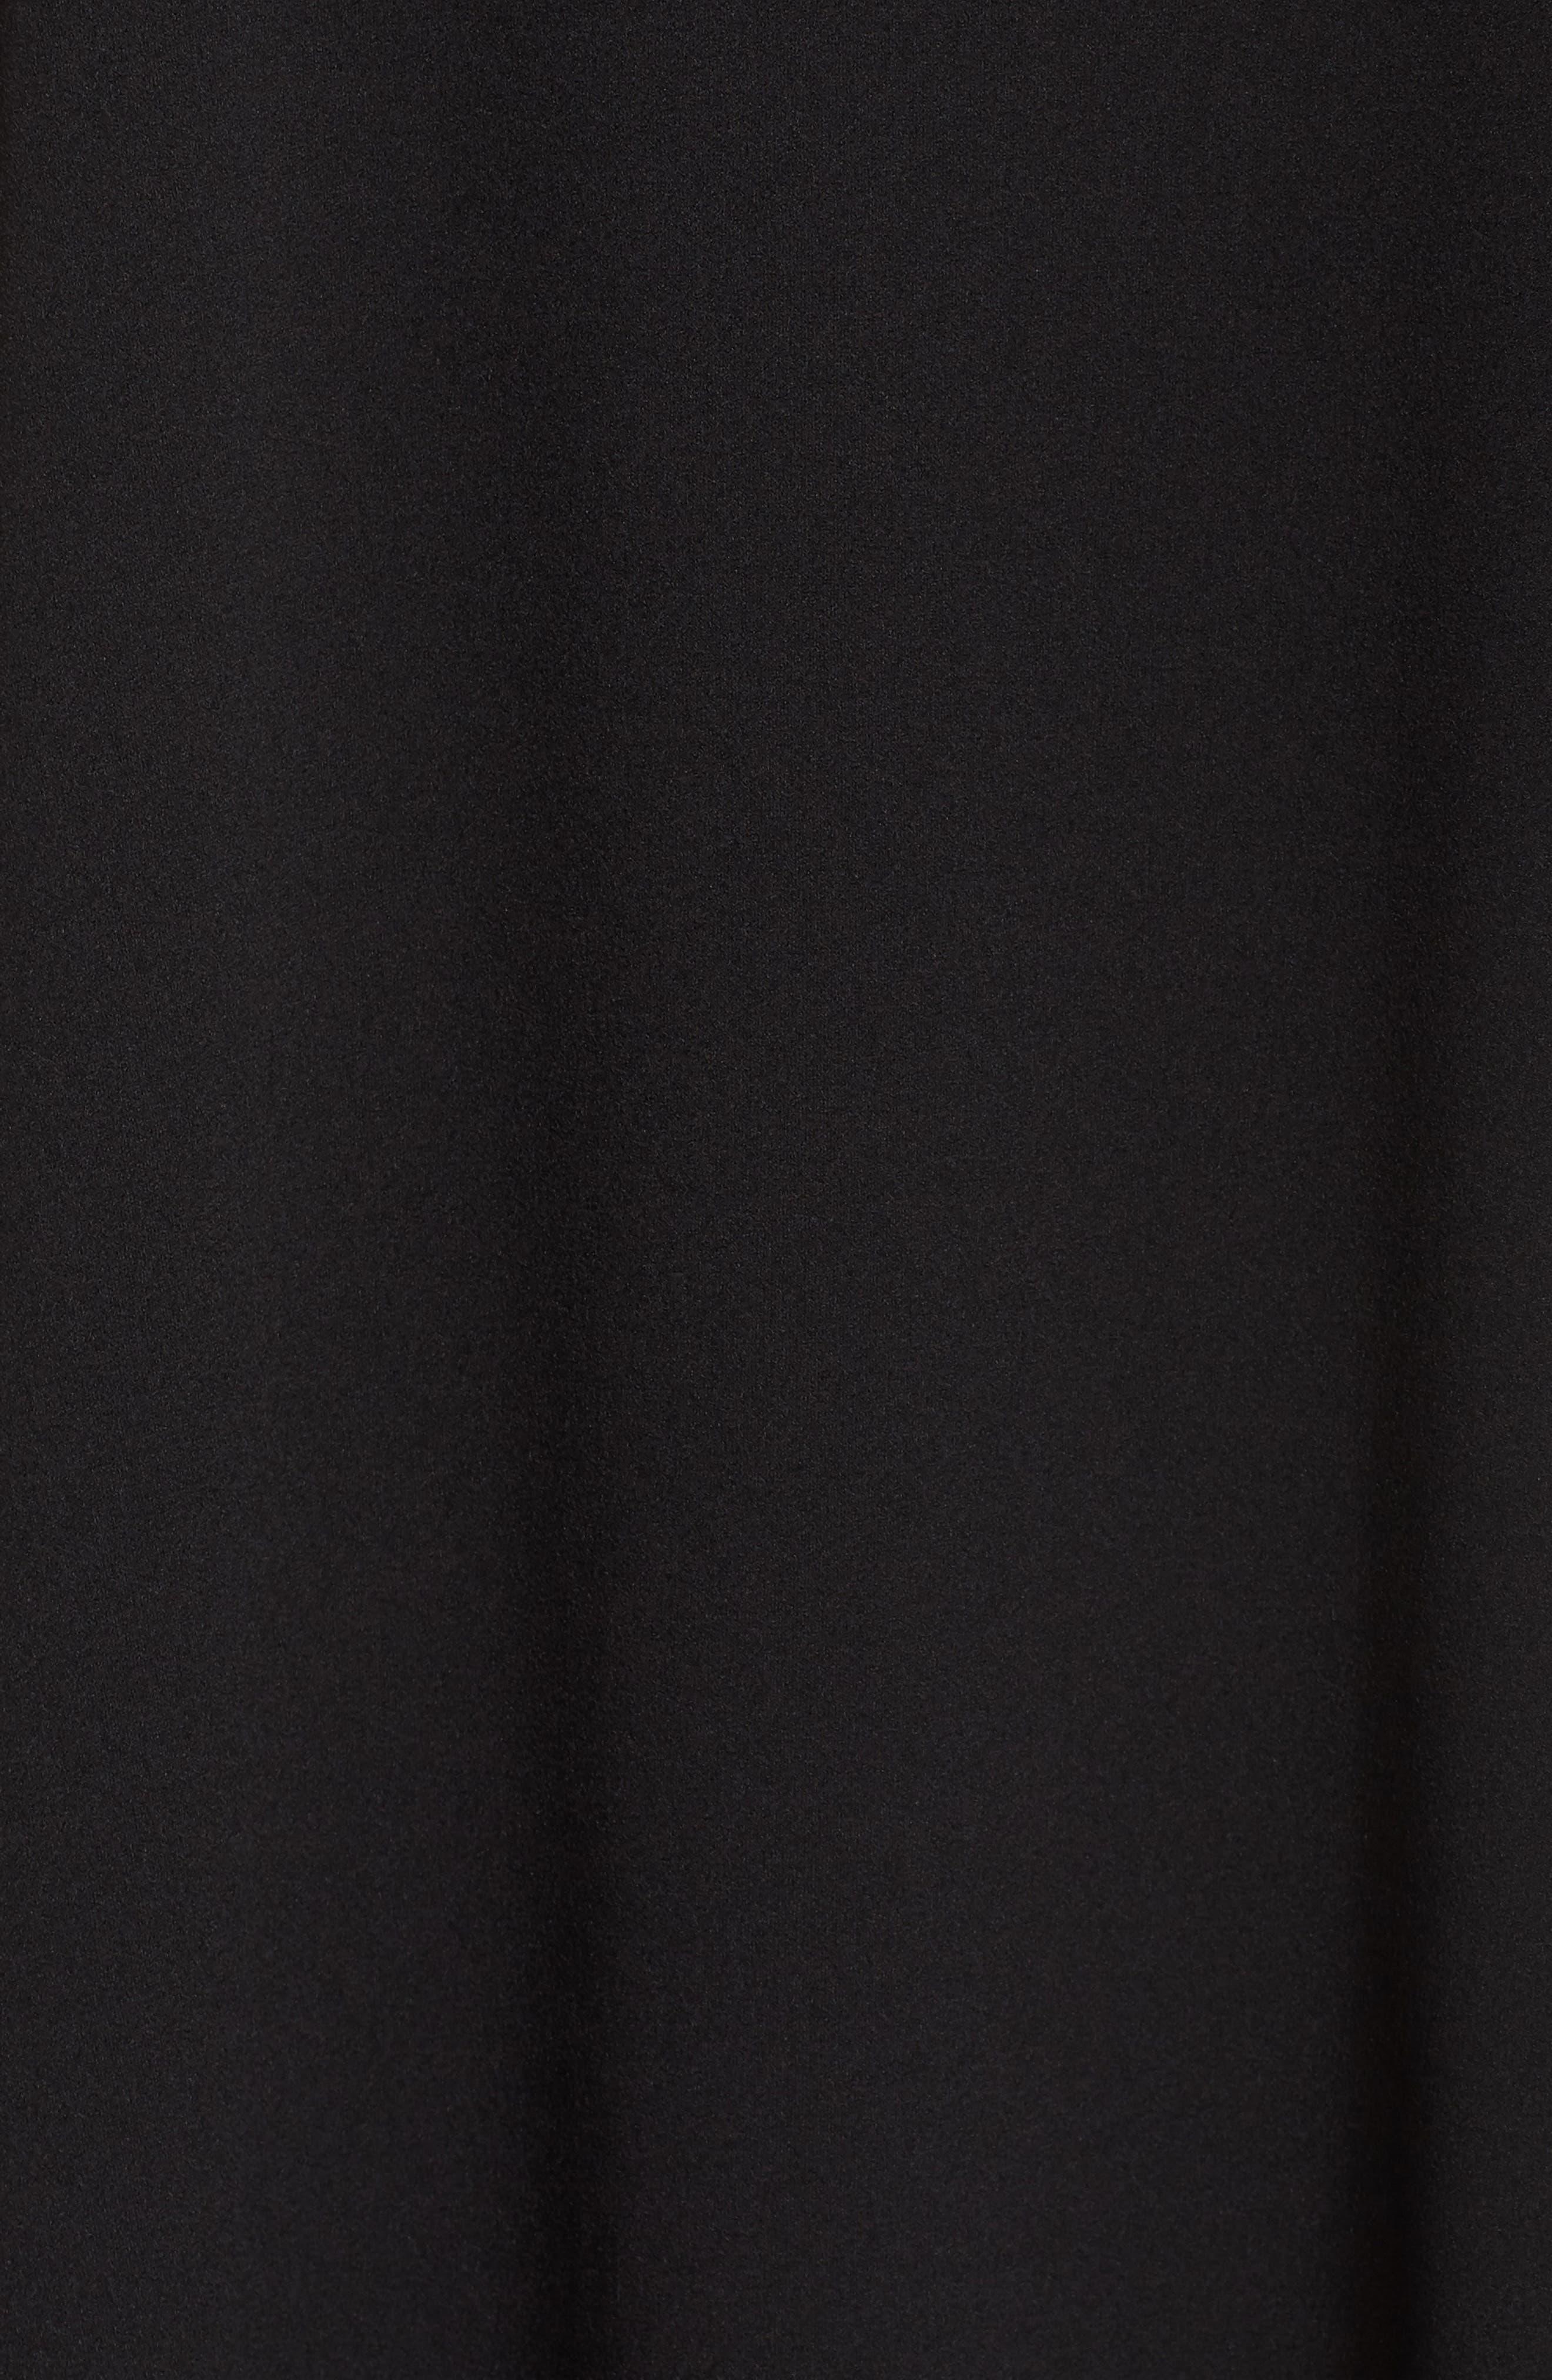 Short Sleeve Knit Dress,                             Alternate thumbnail 5, color,                             Black